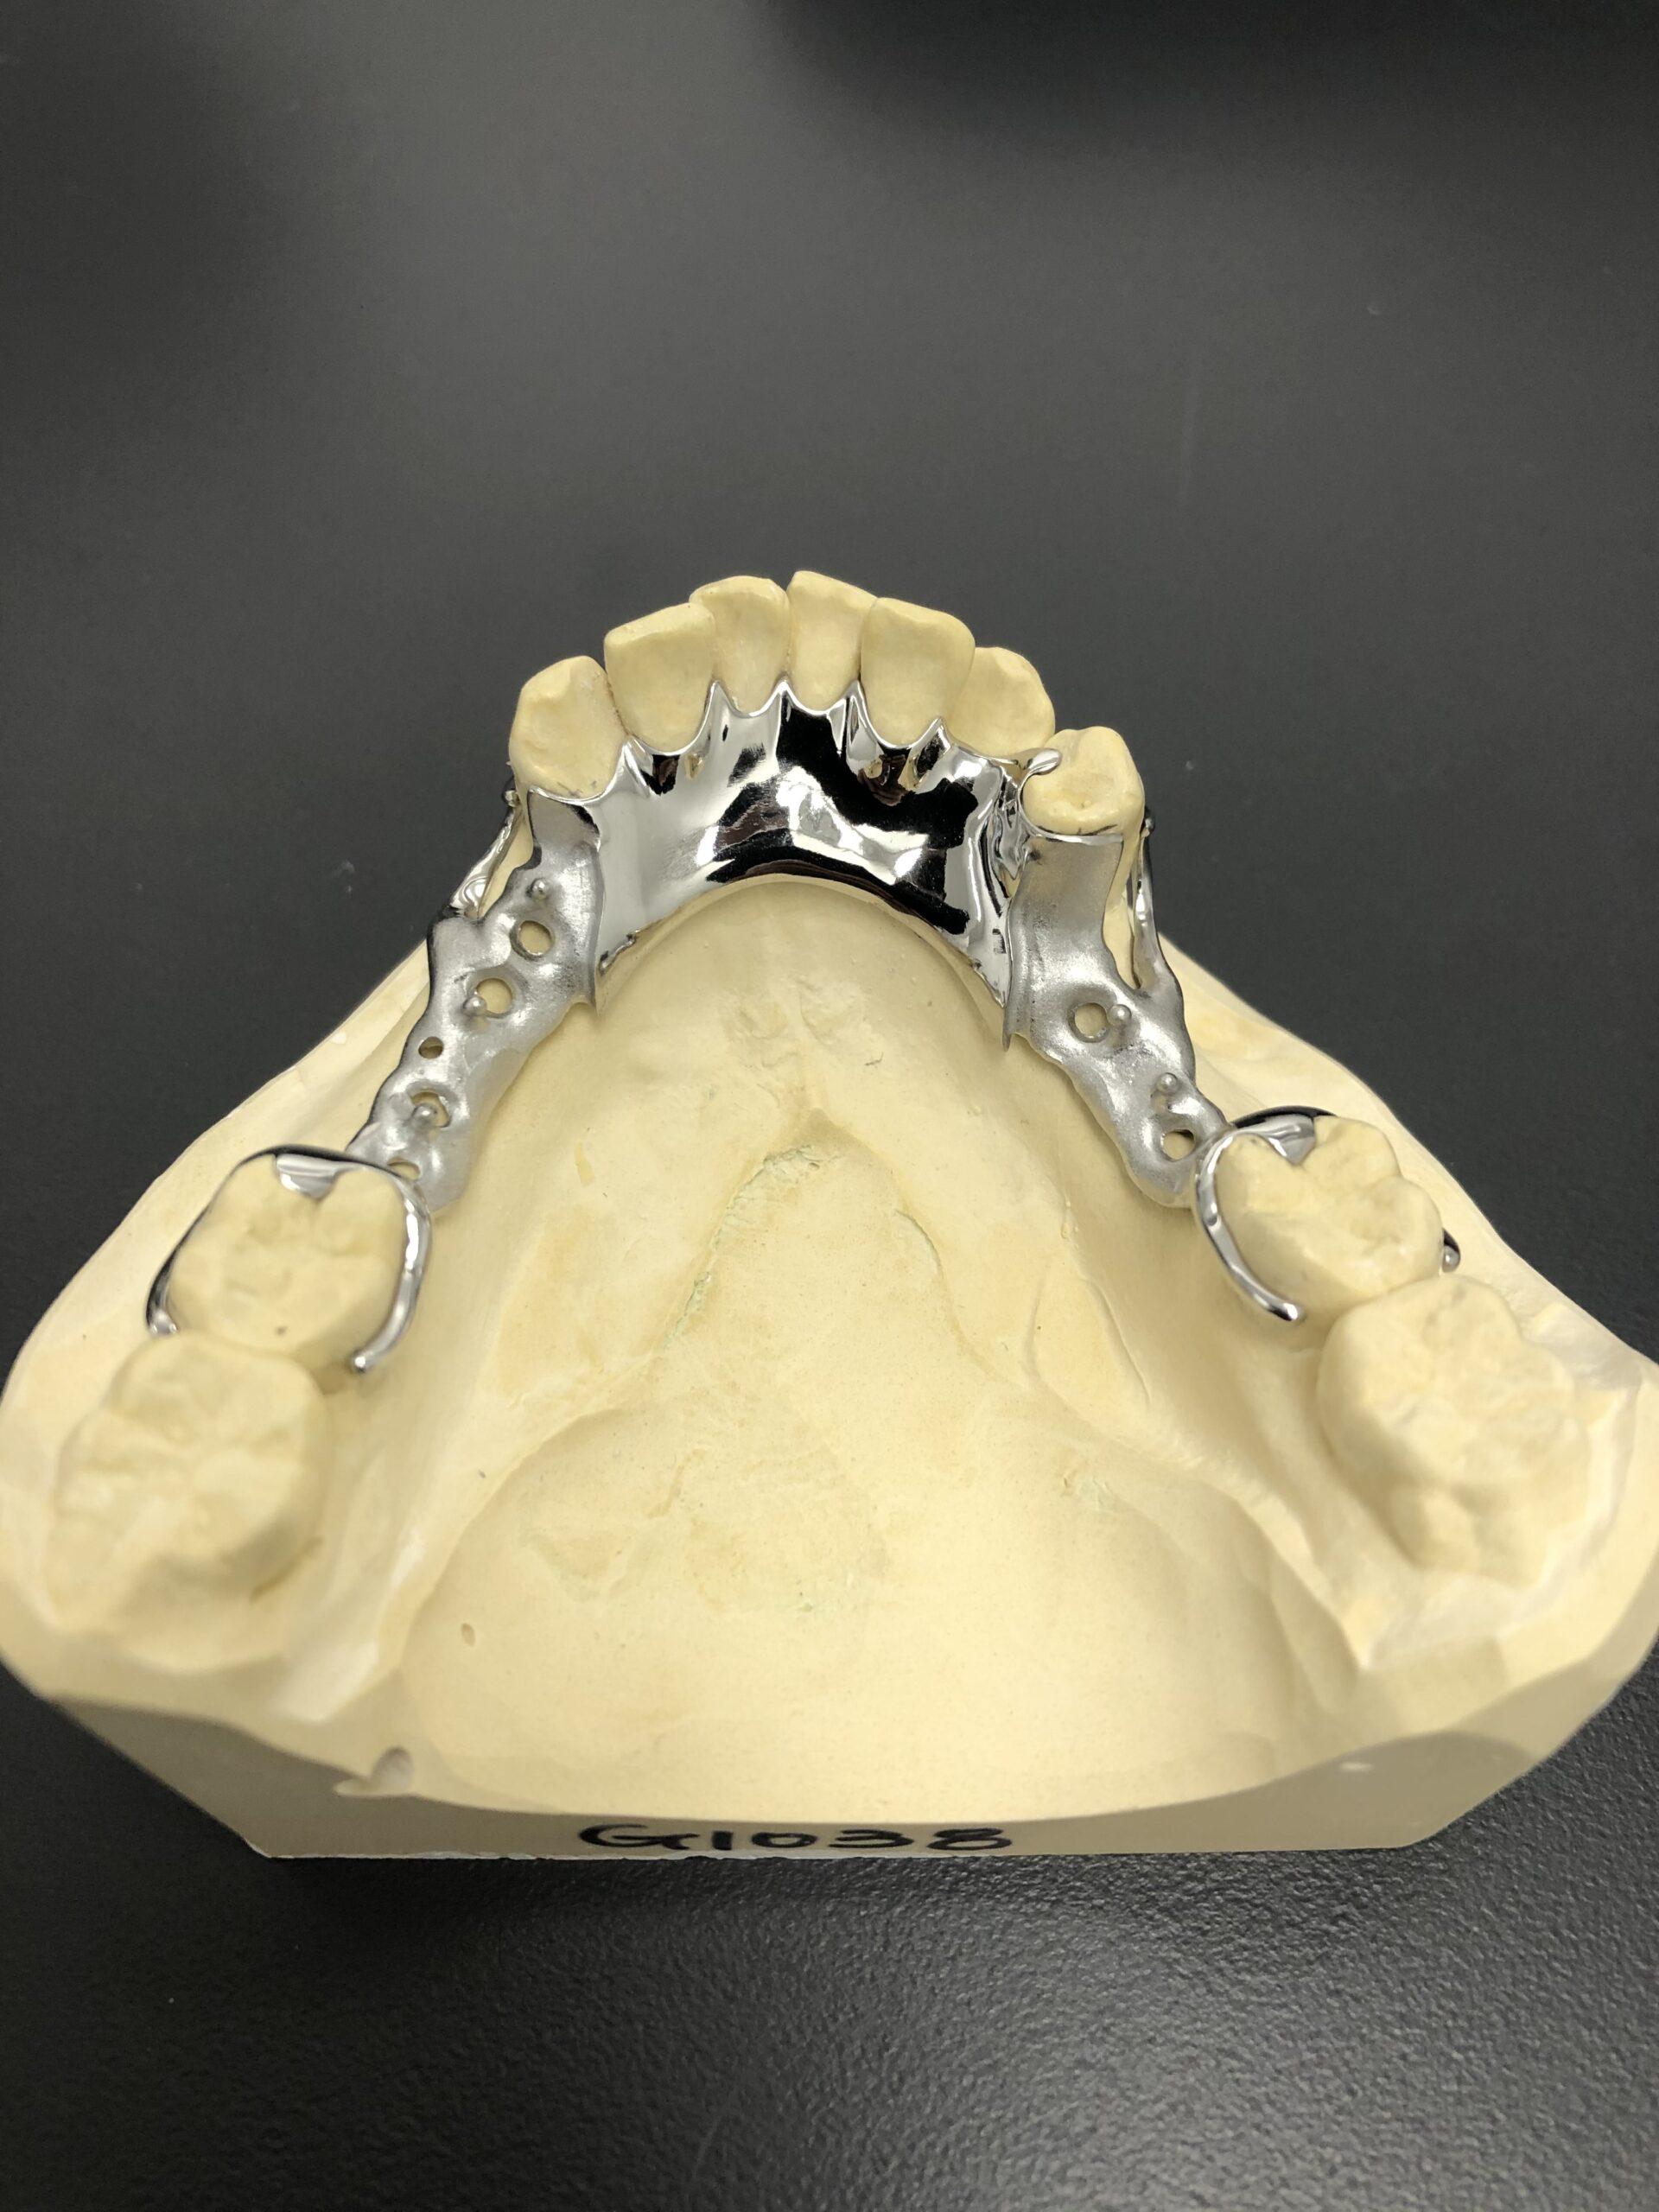 calgary dentures yyc denture clinic calgary